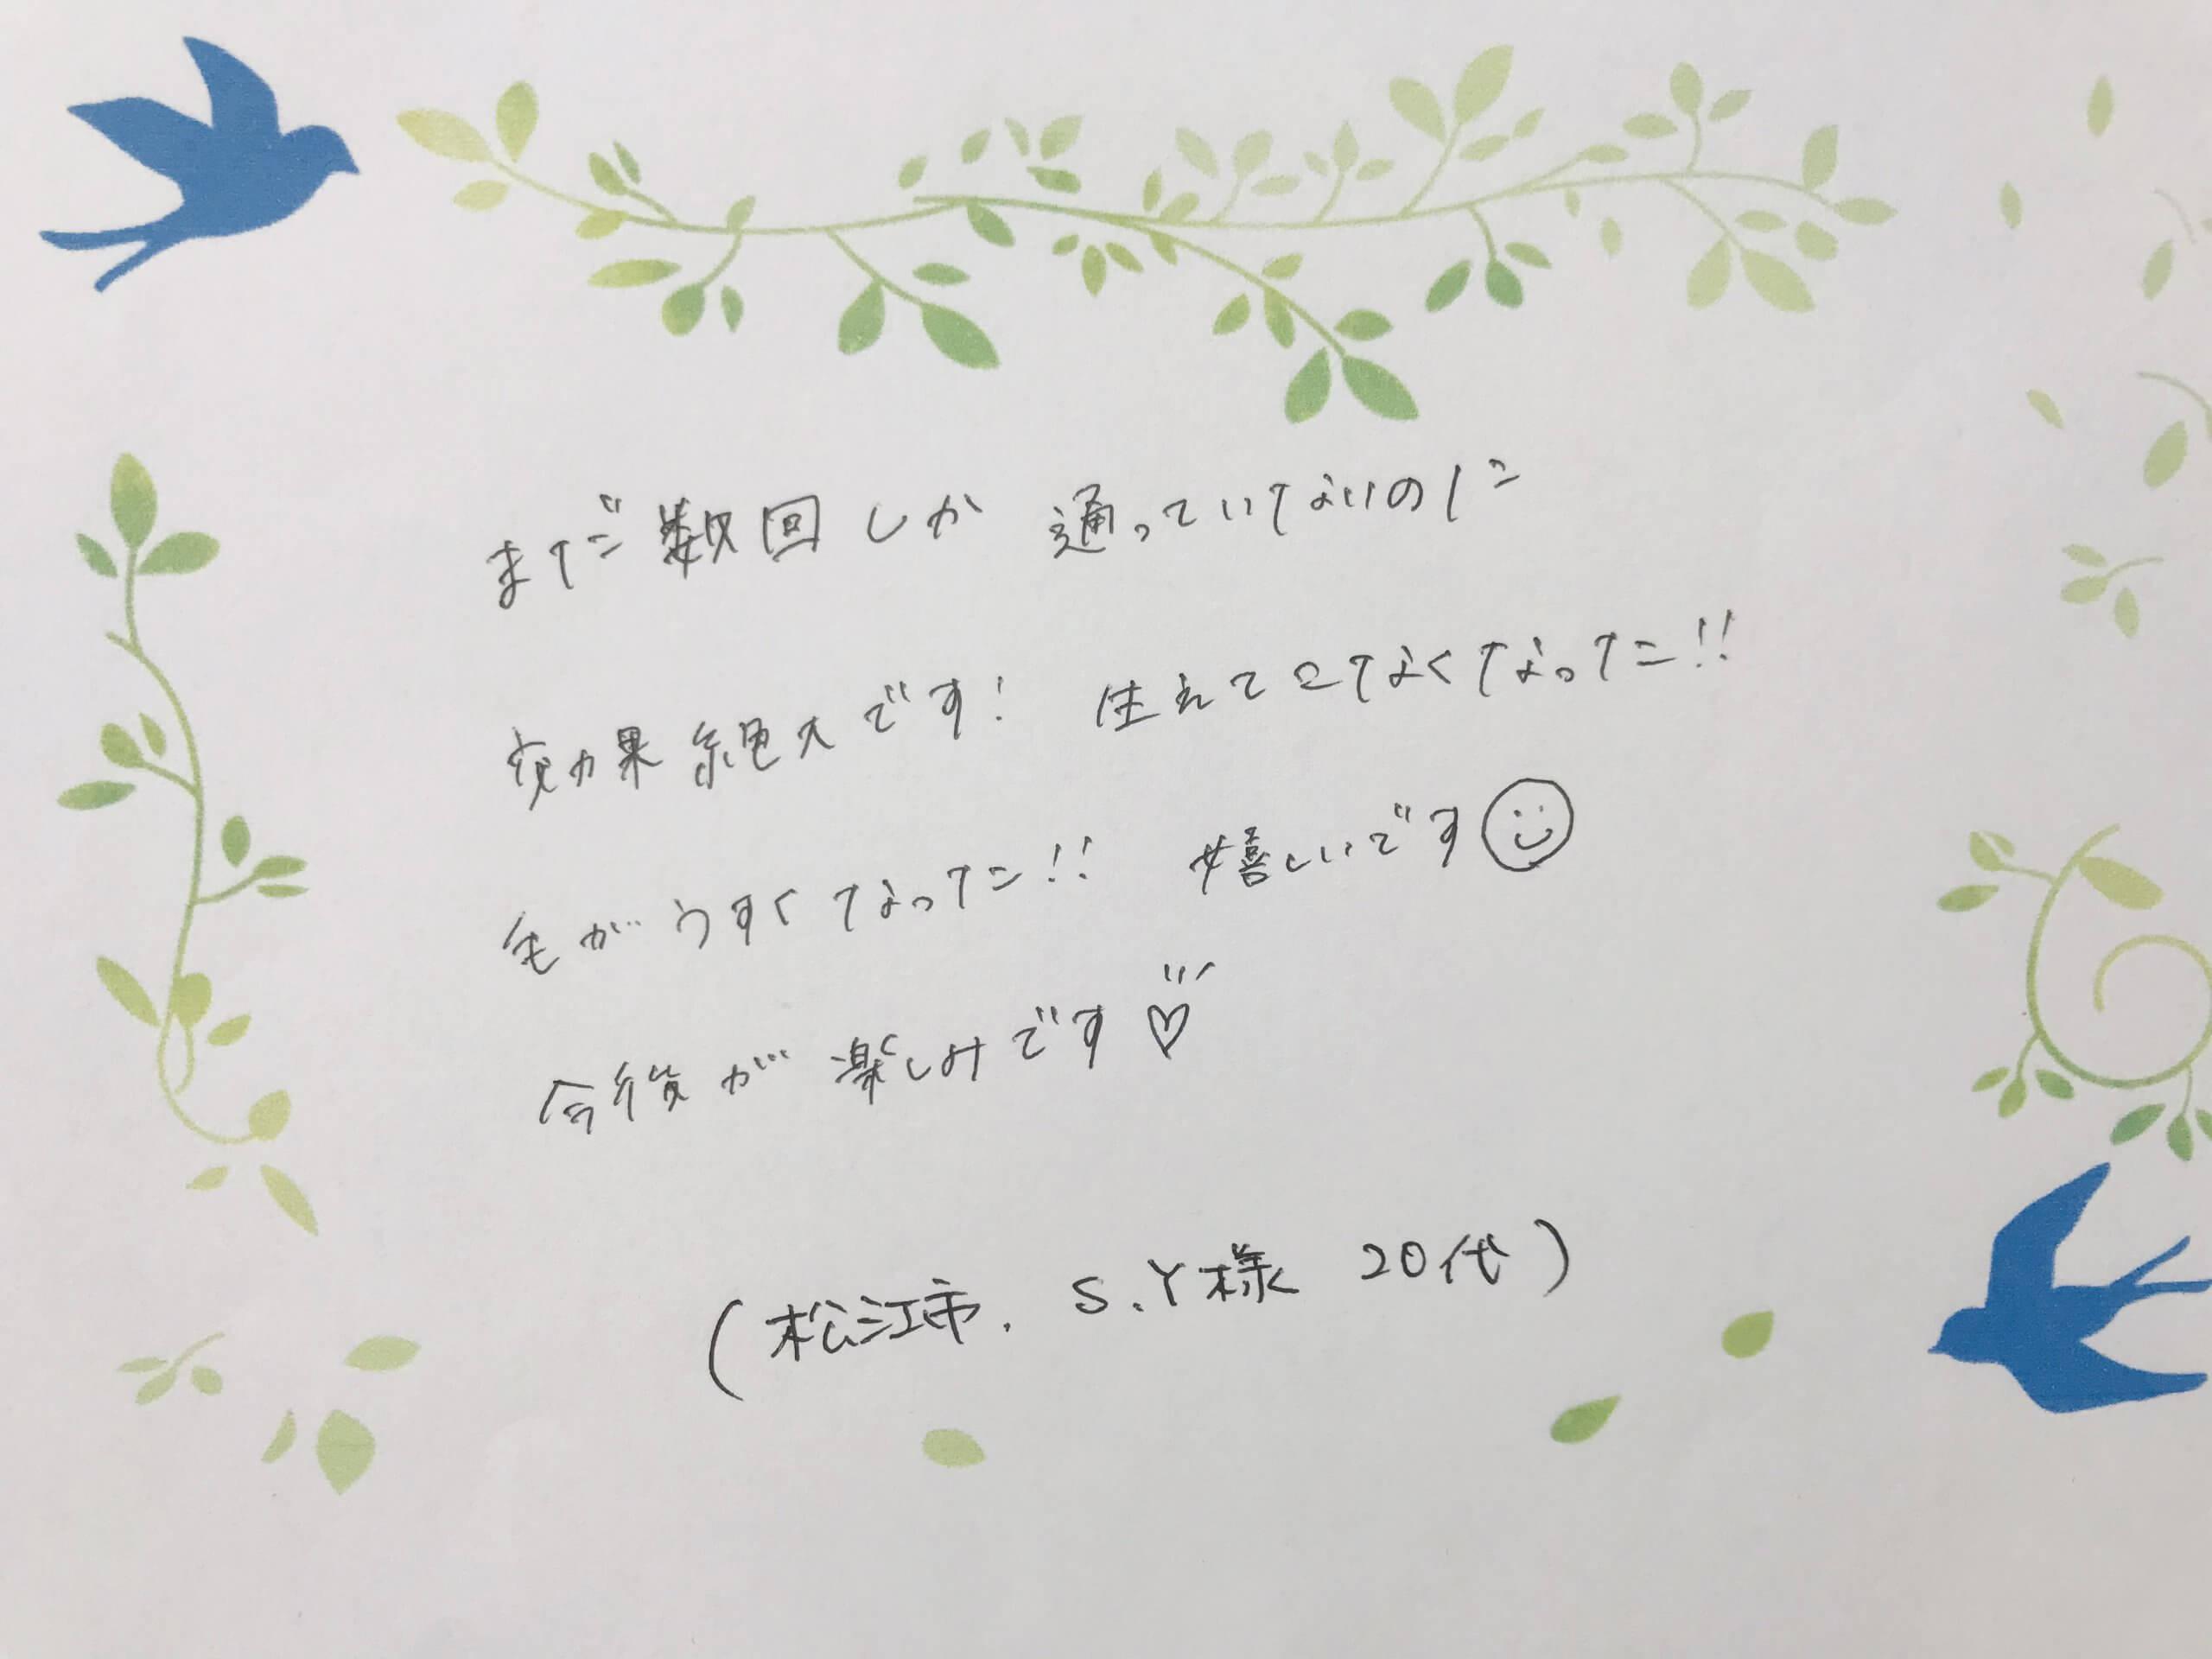 松江市付近20代S.Y様/全身脱毛/vio/顔口コミ